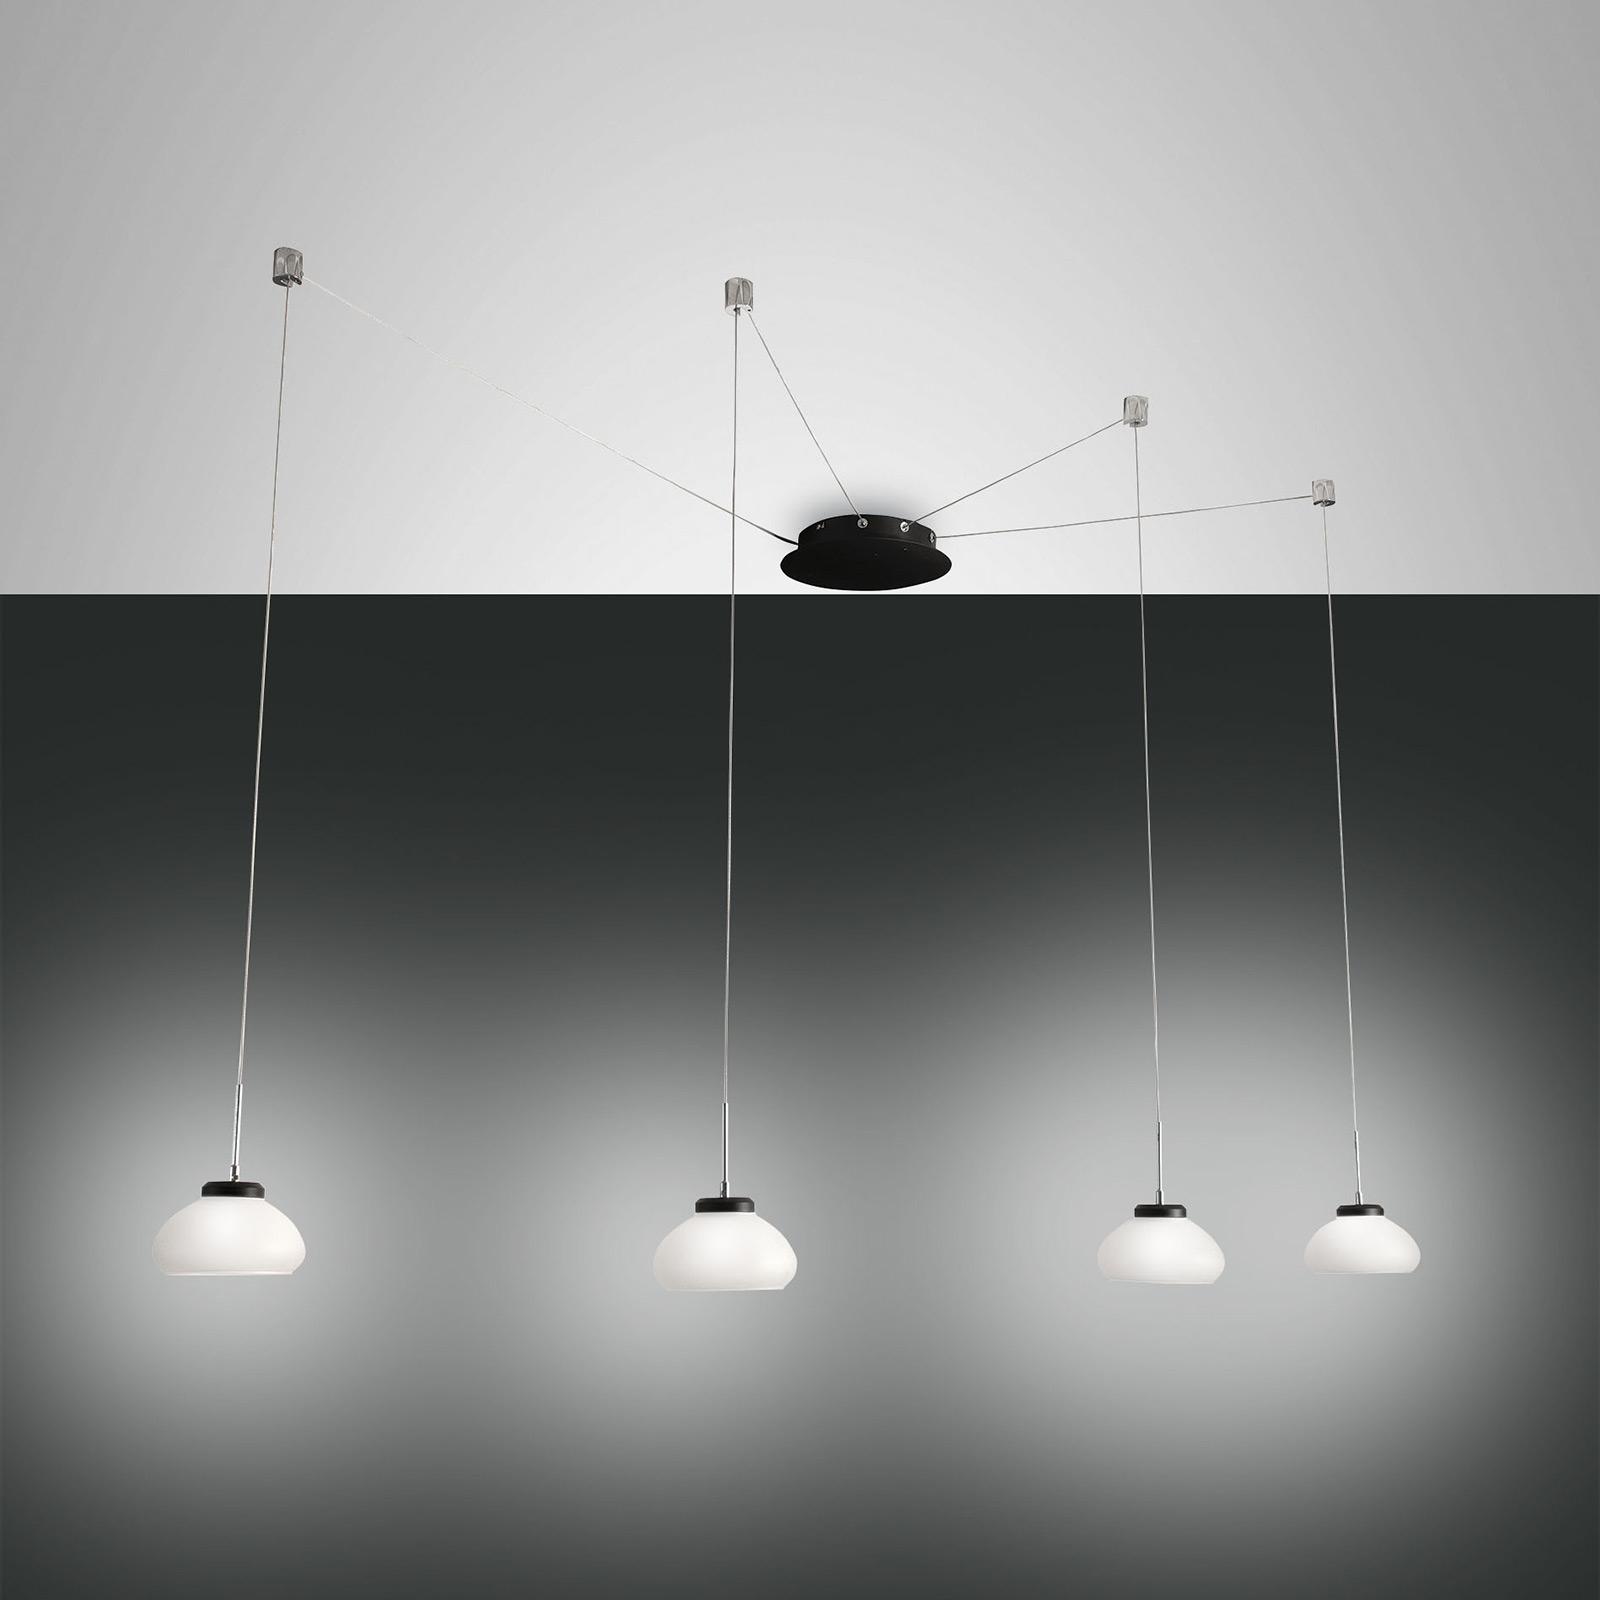 Lampa wisząca Arabella decentralna, 4-pkt. biała